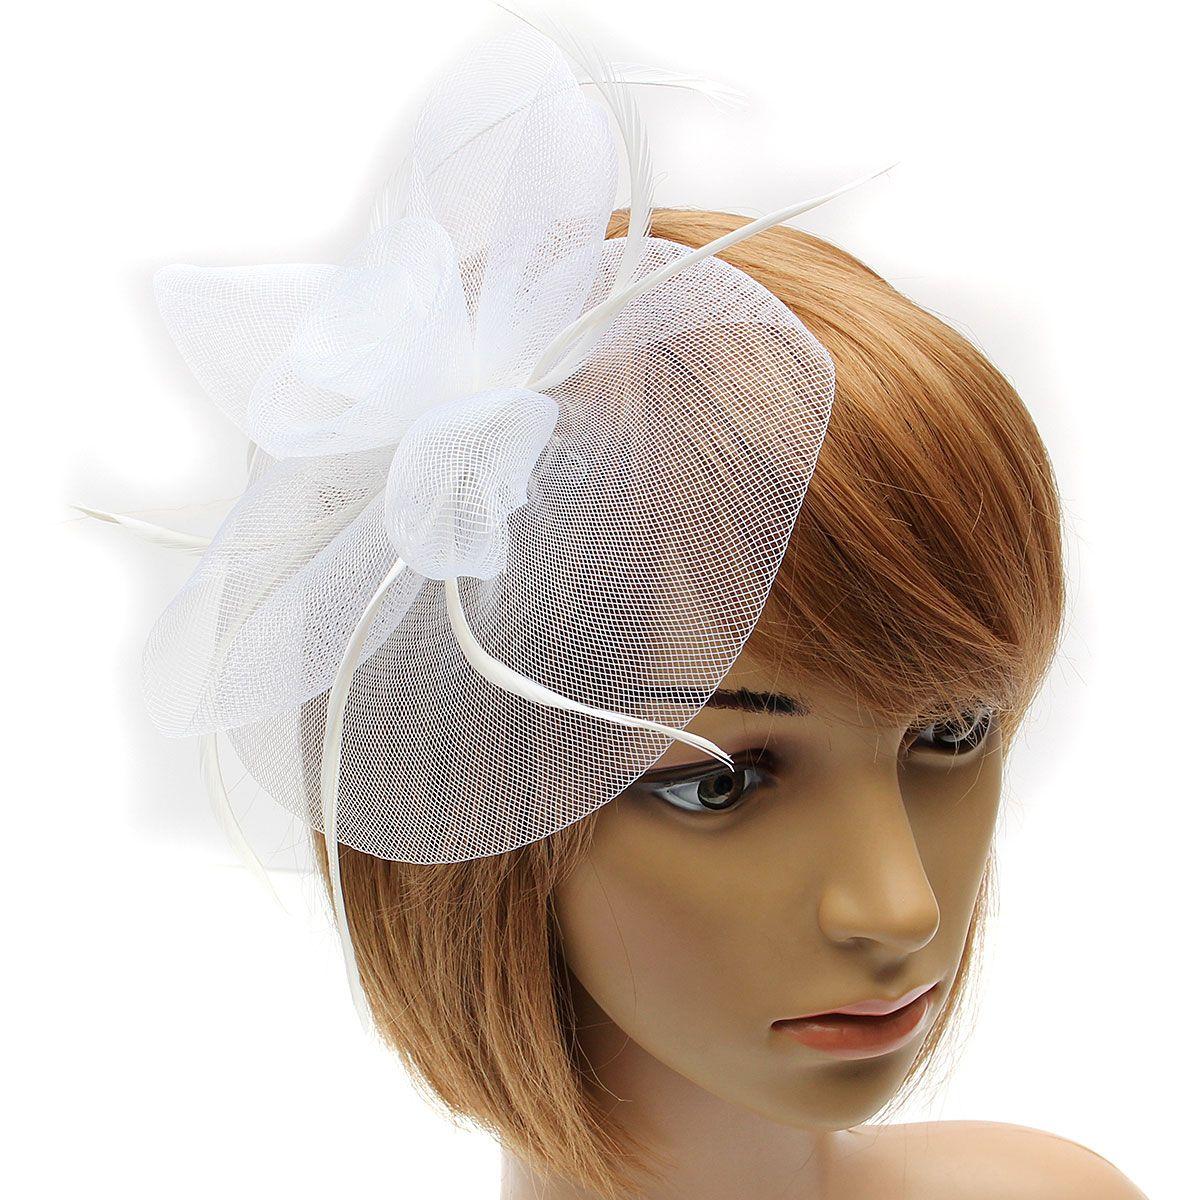 New Lady Girl Fascinator Hat Feather Veil Net Cocktail Party Church Wedding  - Walmart.com a7db1553944